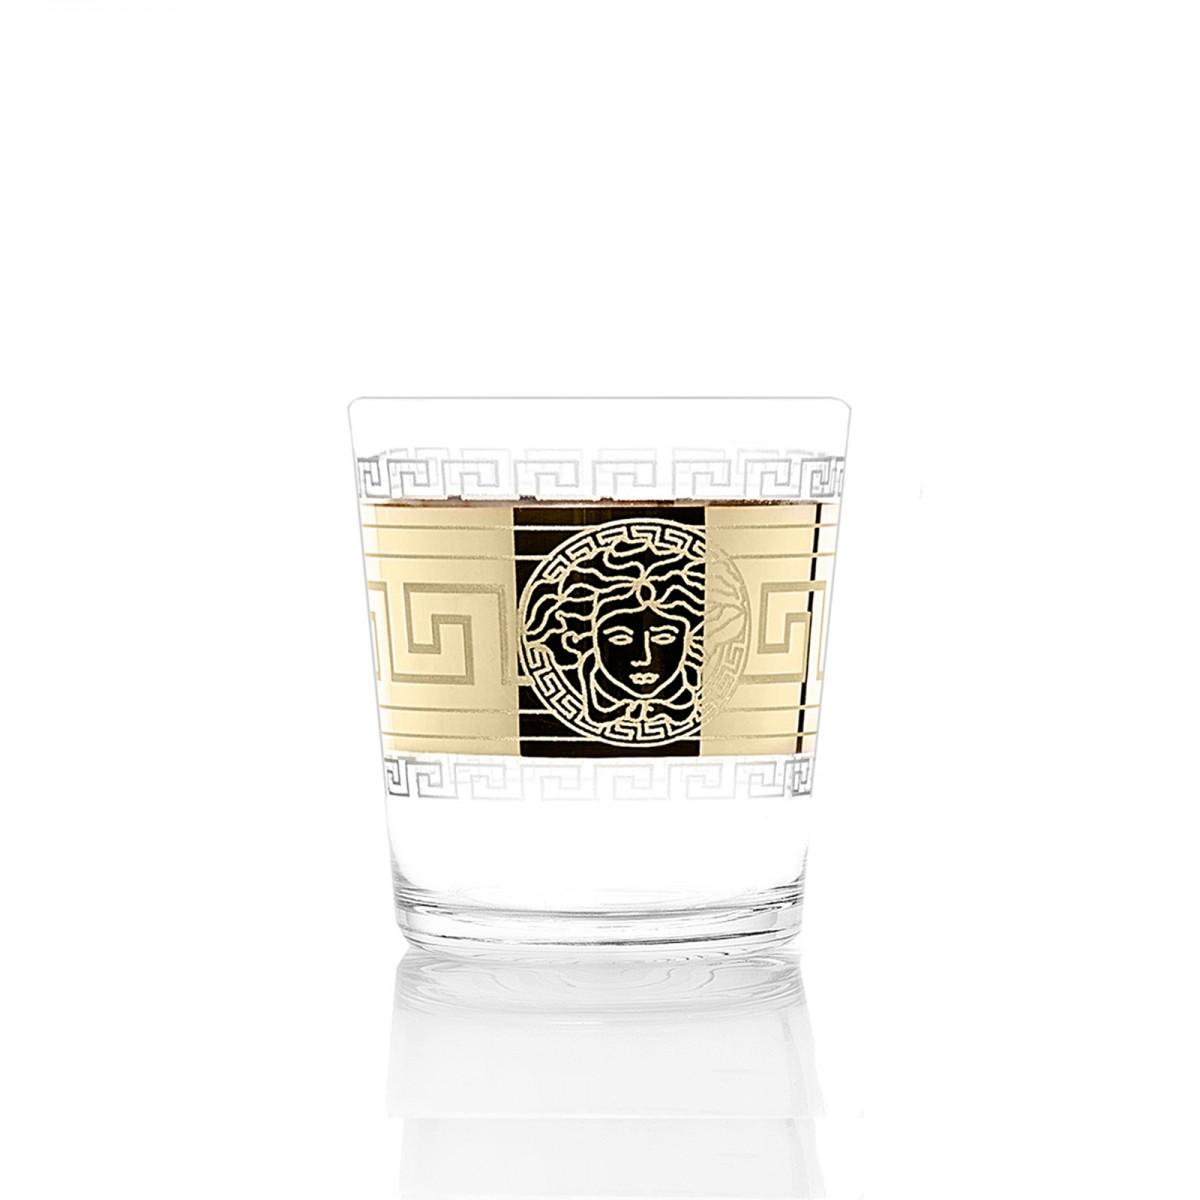 GN3_40_3 Набор из 6 стаканов «Версаль», 250 мл